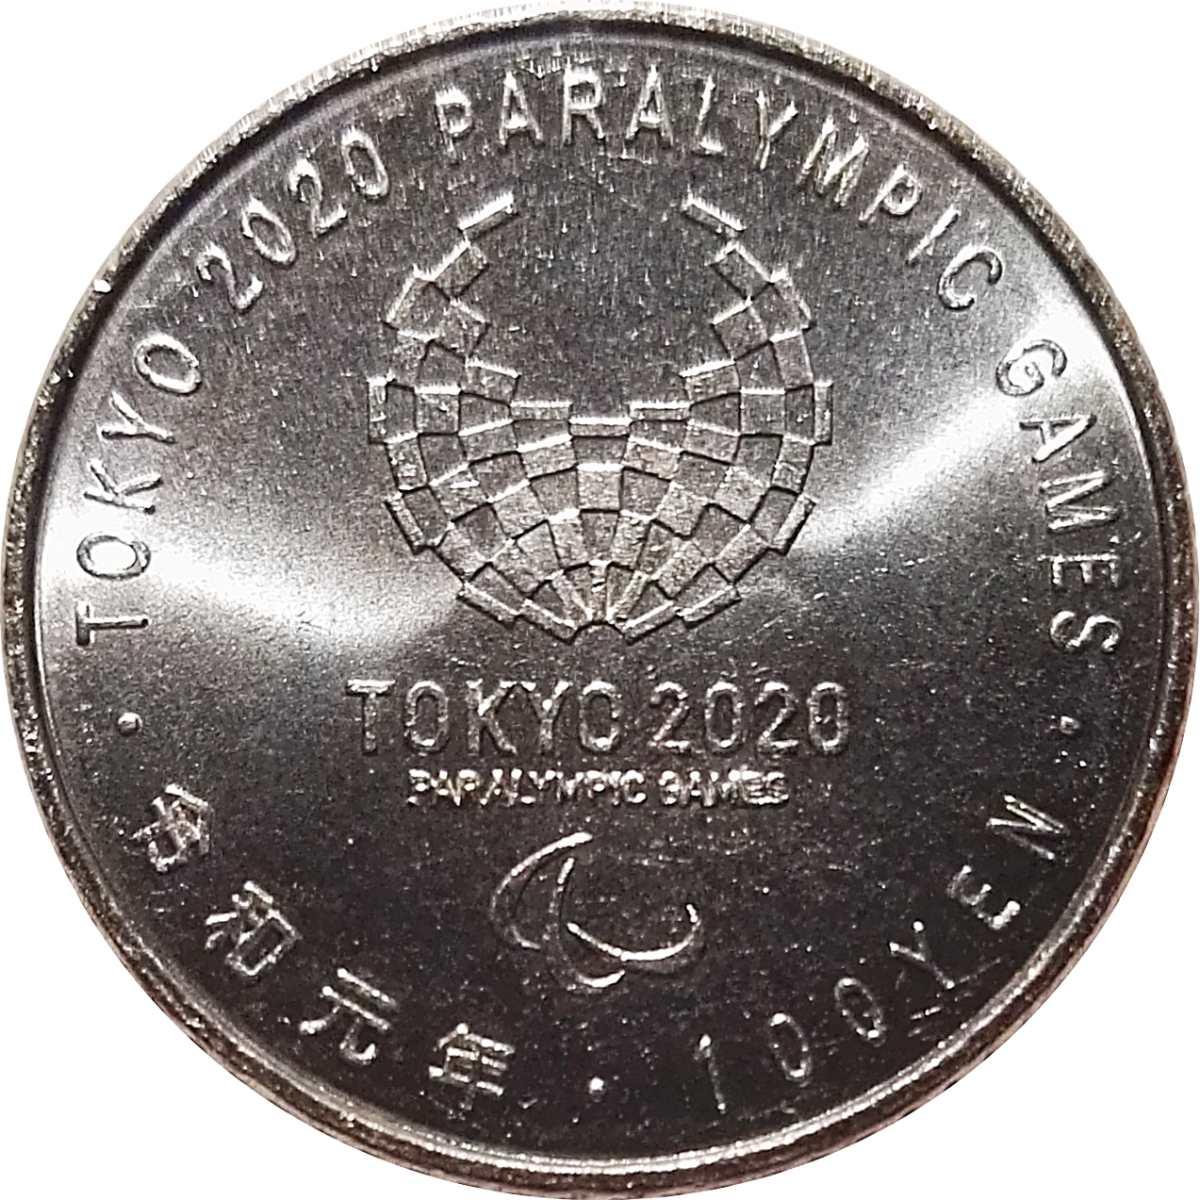 JAPAN SET 2 COINS 100 YEN FENCING BOCCIA TOKYO OLYMPIC 2020 HESEI 30 2018 UNC